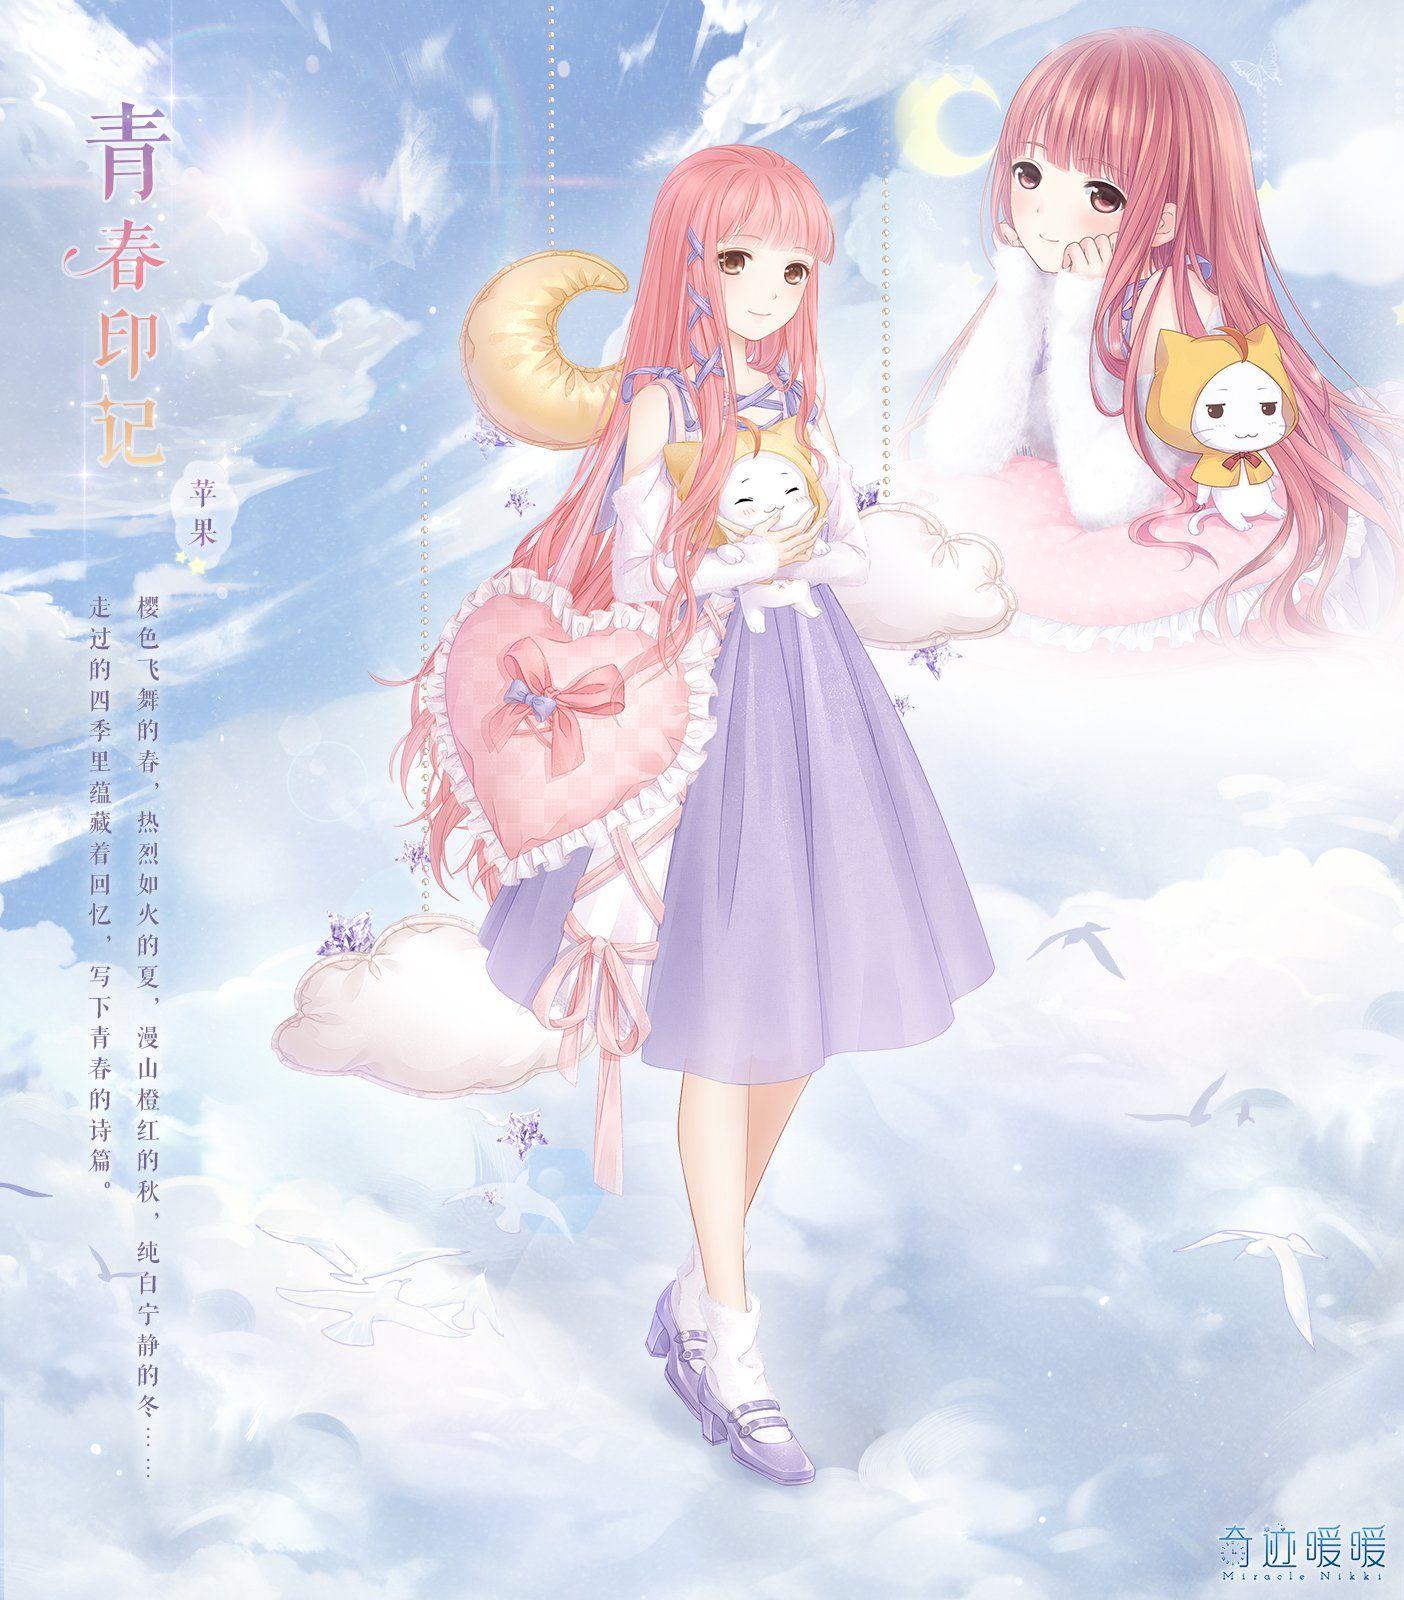 🌴十条奇迹暖暖🌴 on Seni anime, Seni